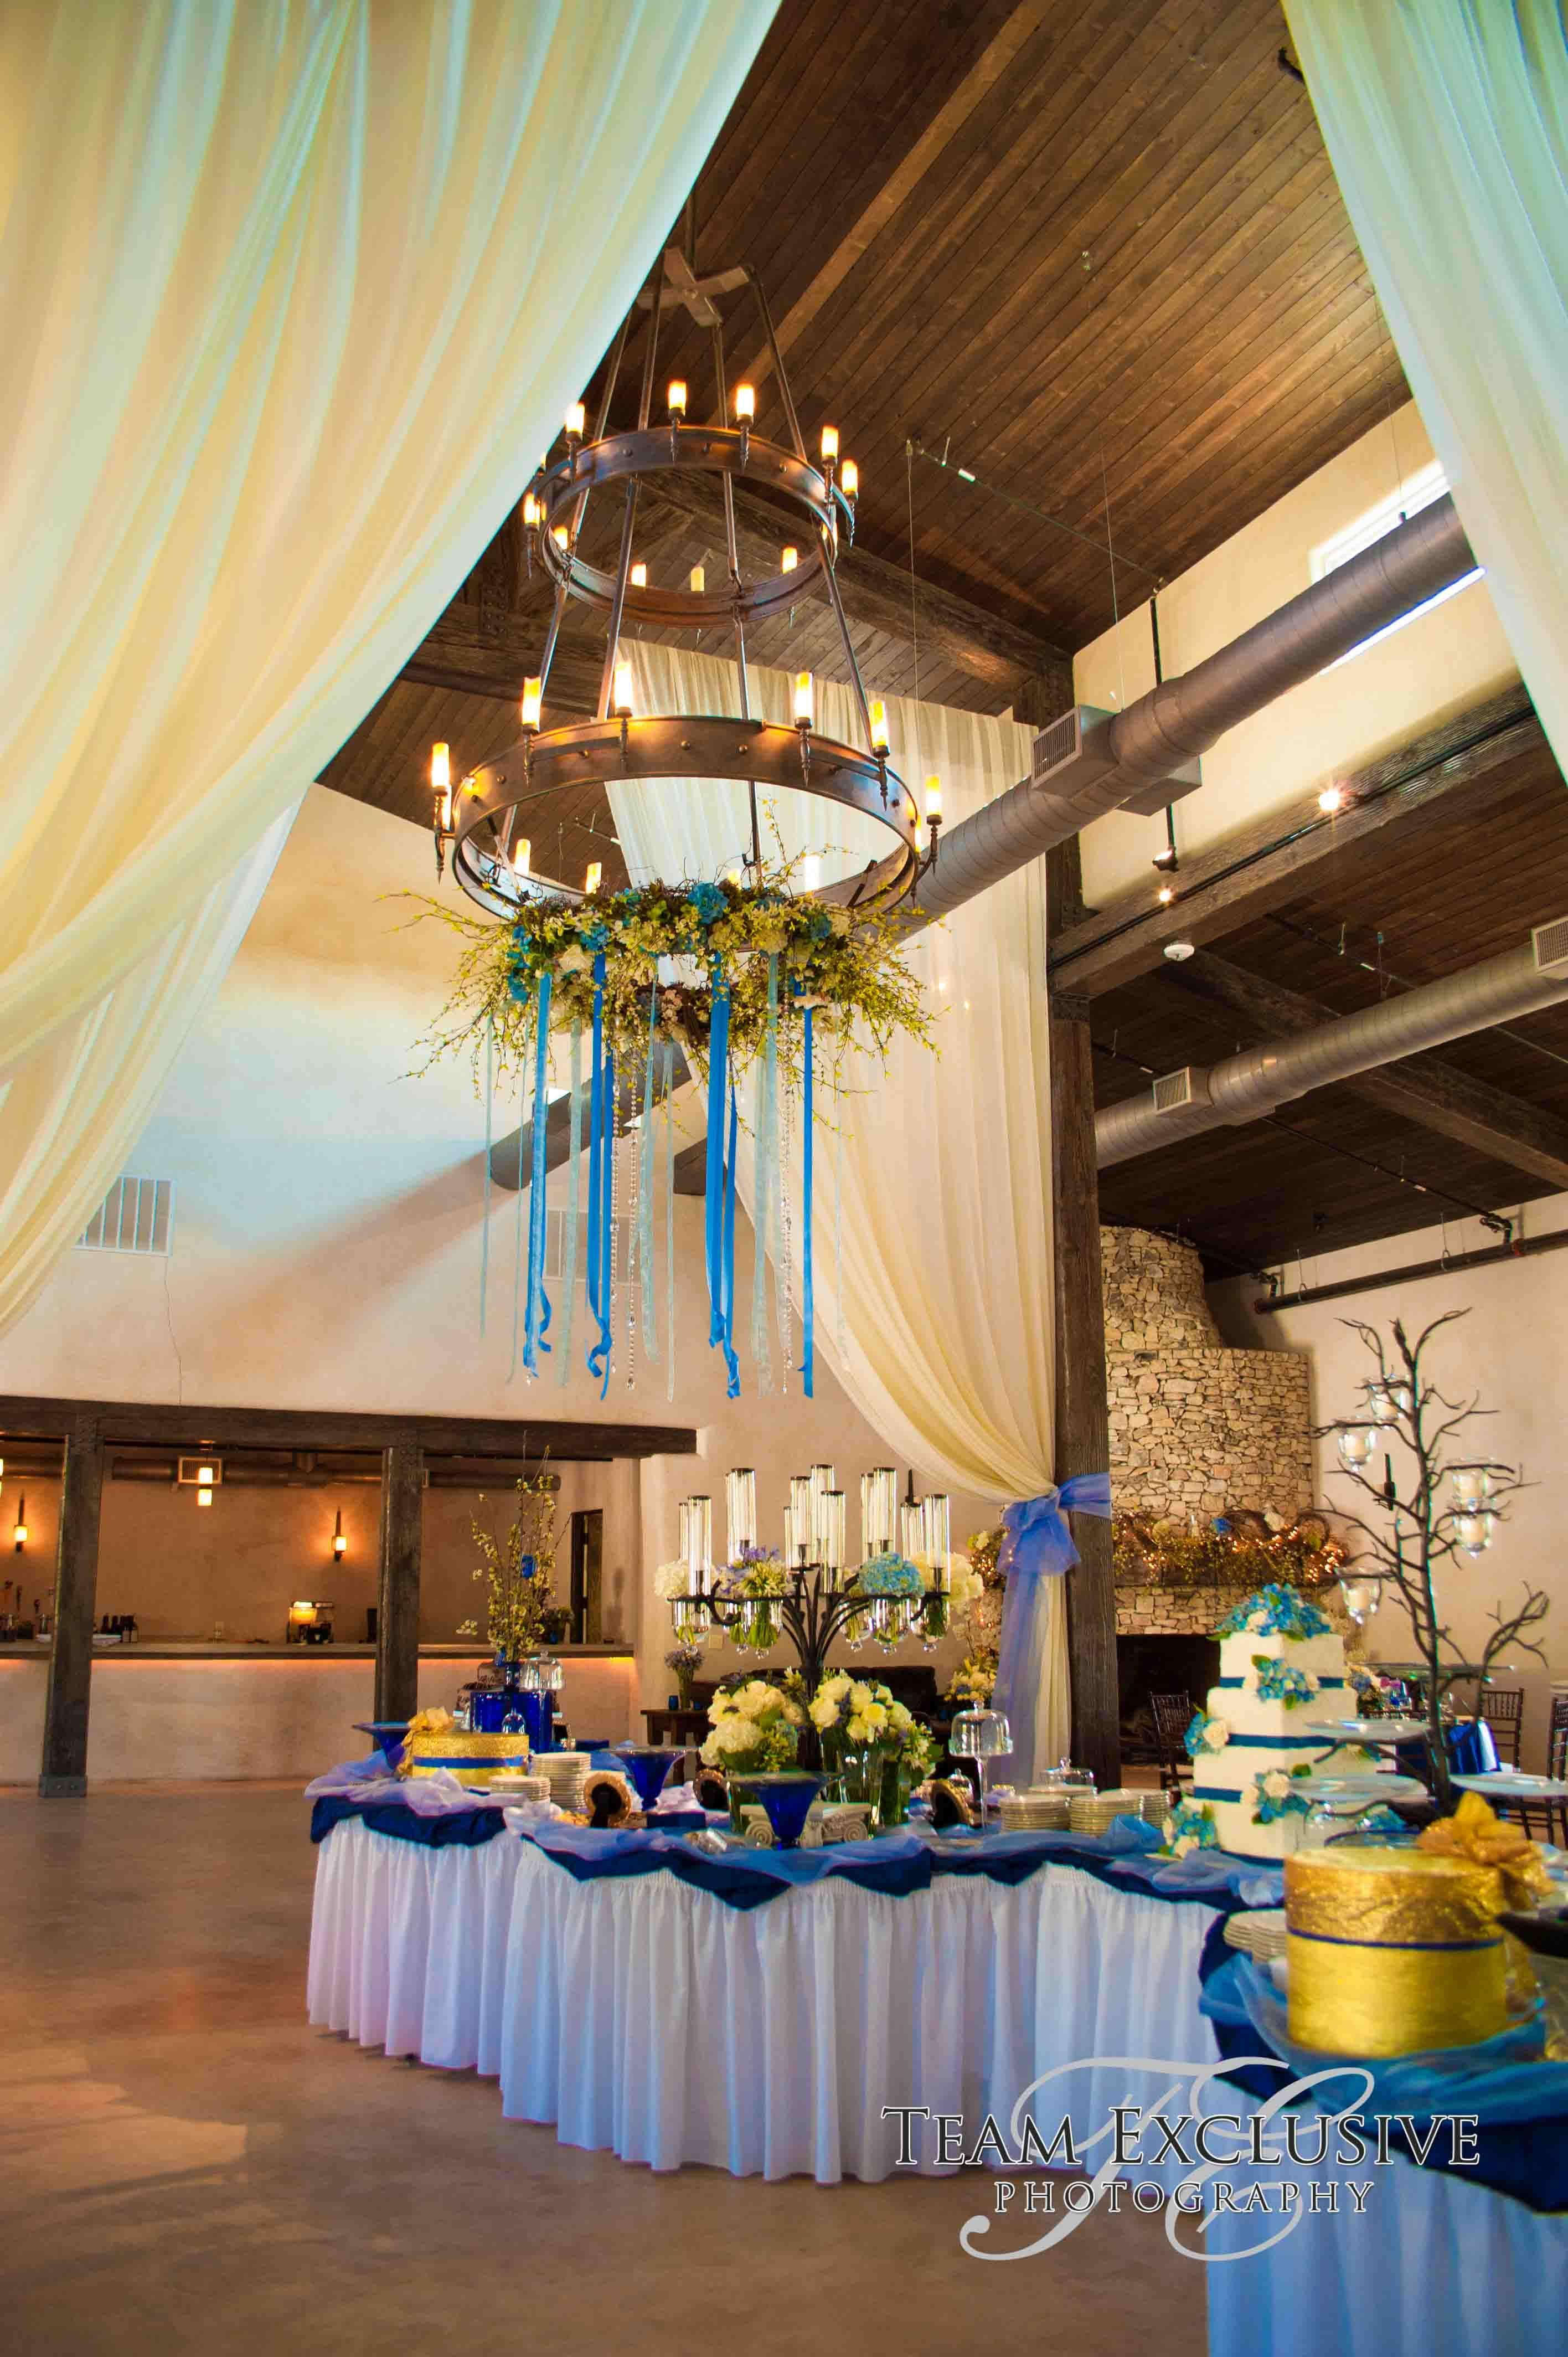 Lost mission wedding decor spring branch texas hill country lost mission wedding decor spring branch texas hill country weddings photo by team exclusive junglespirit Images